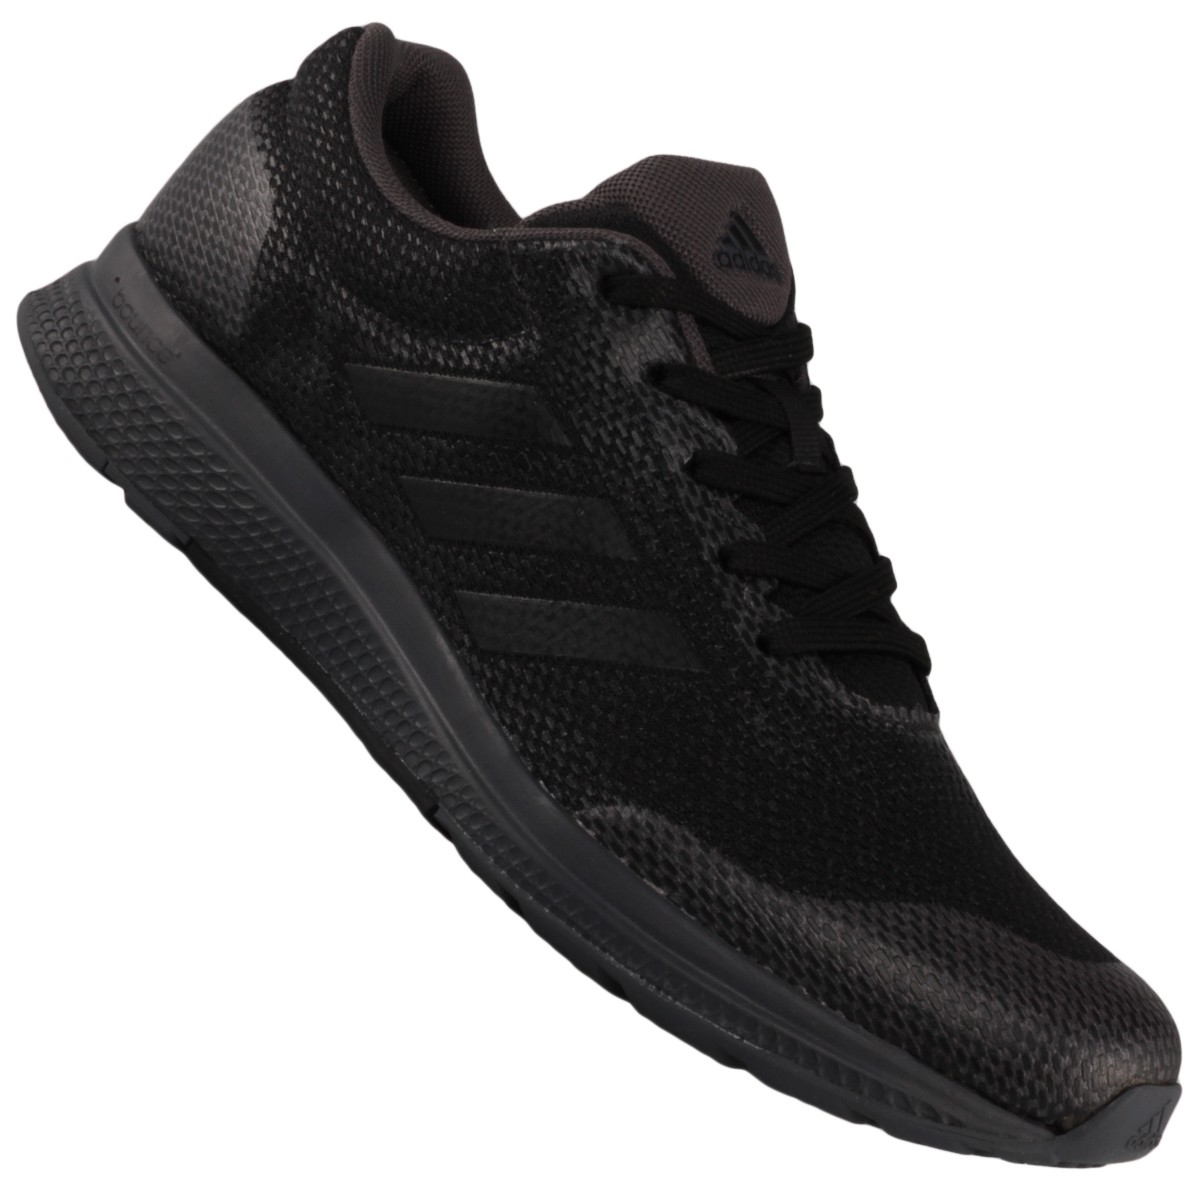 73f7682a4e346 Tênis Adidas Mana Bounce 2 Masculino